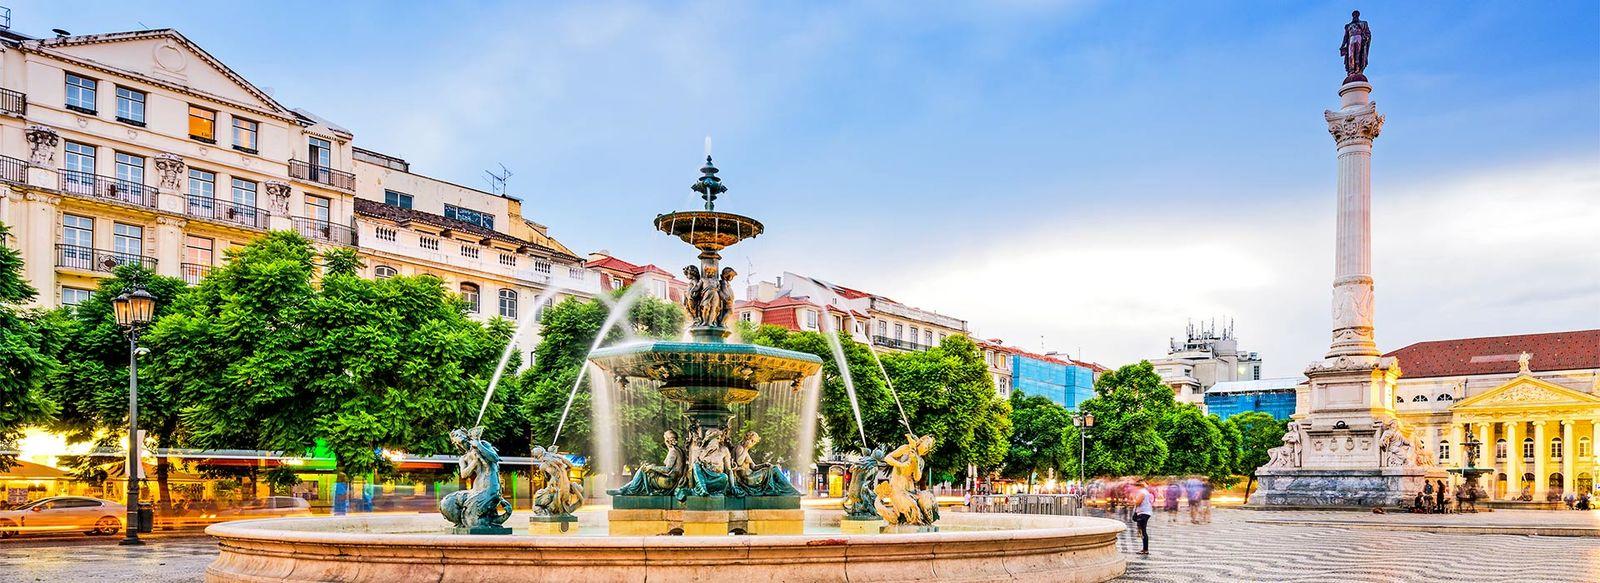 Costeggiando l'Oceano Atlantico a Lisbona